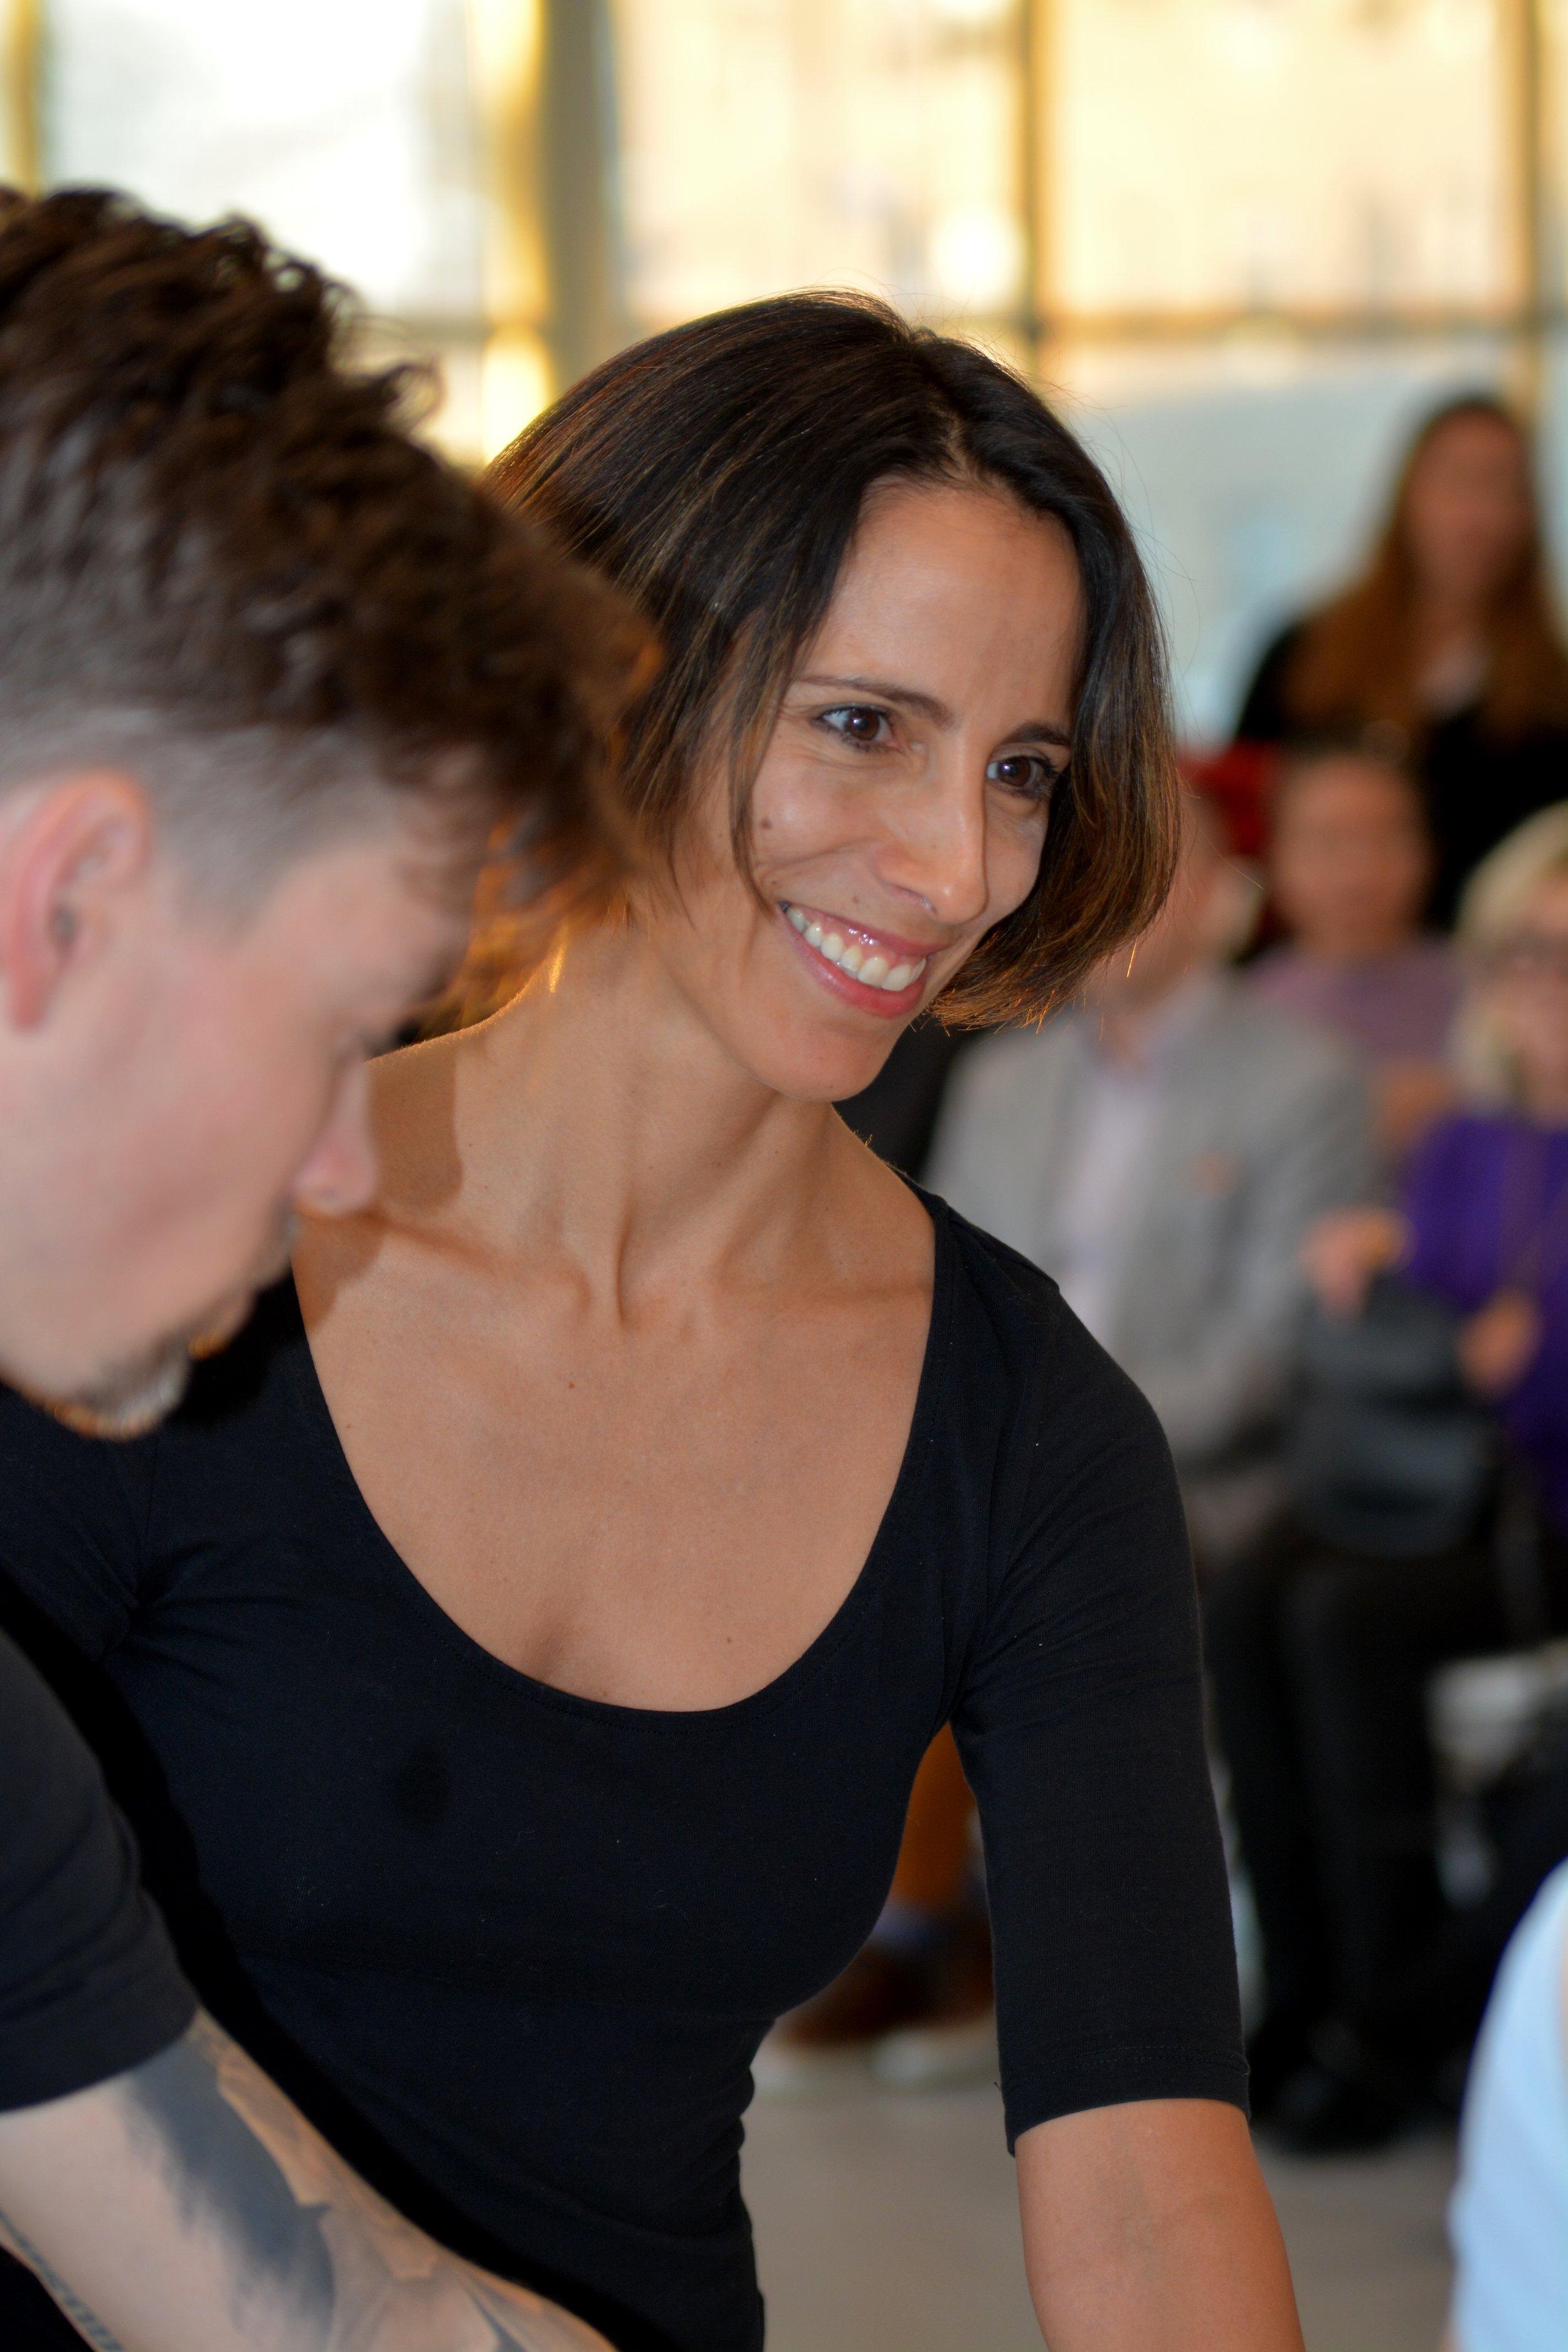 Choreographer Annabelle Lopez Ochoa